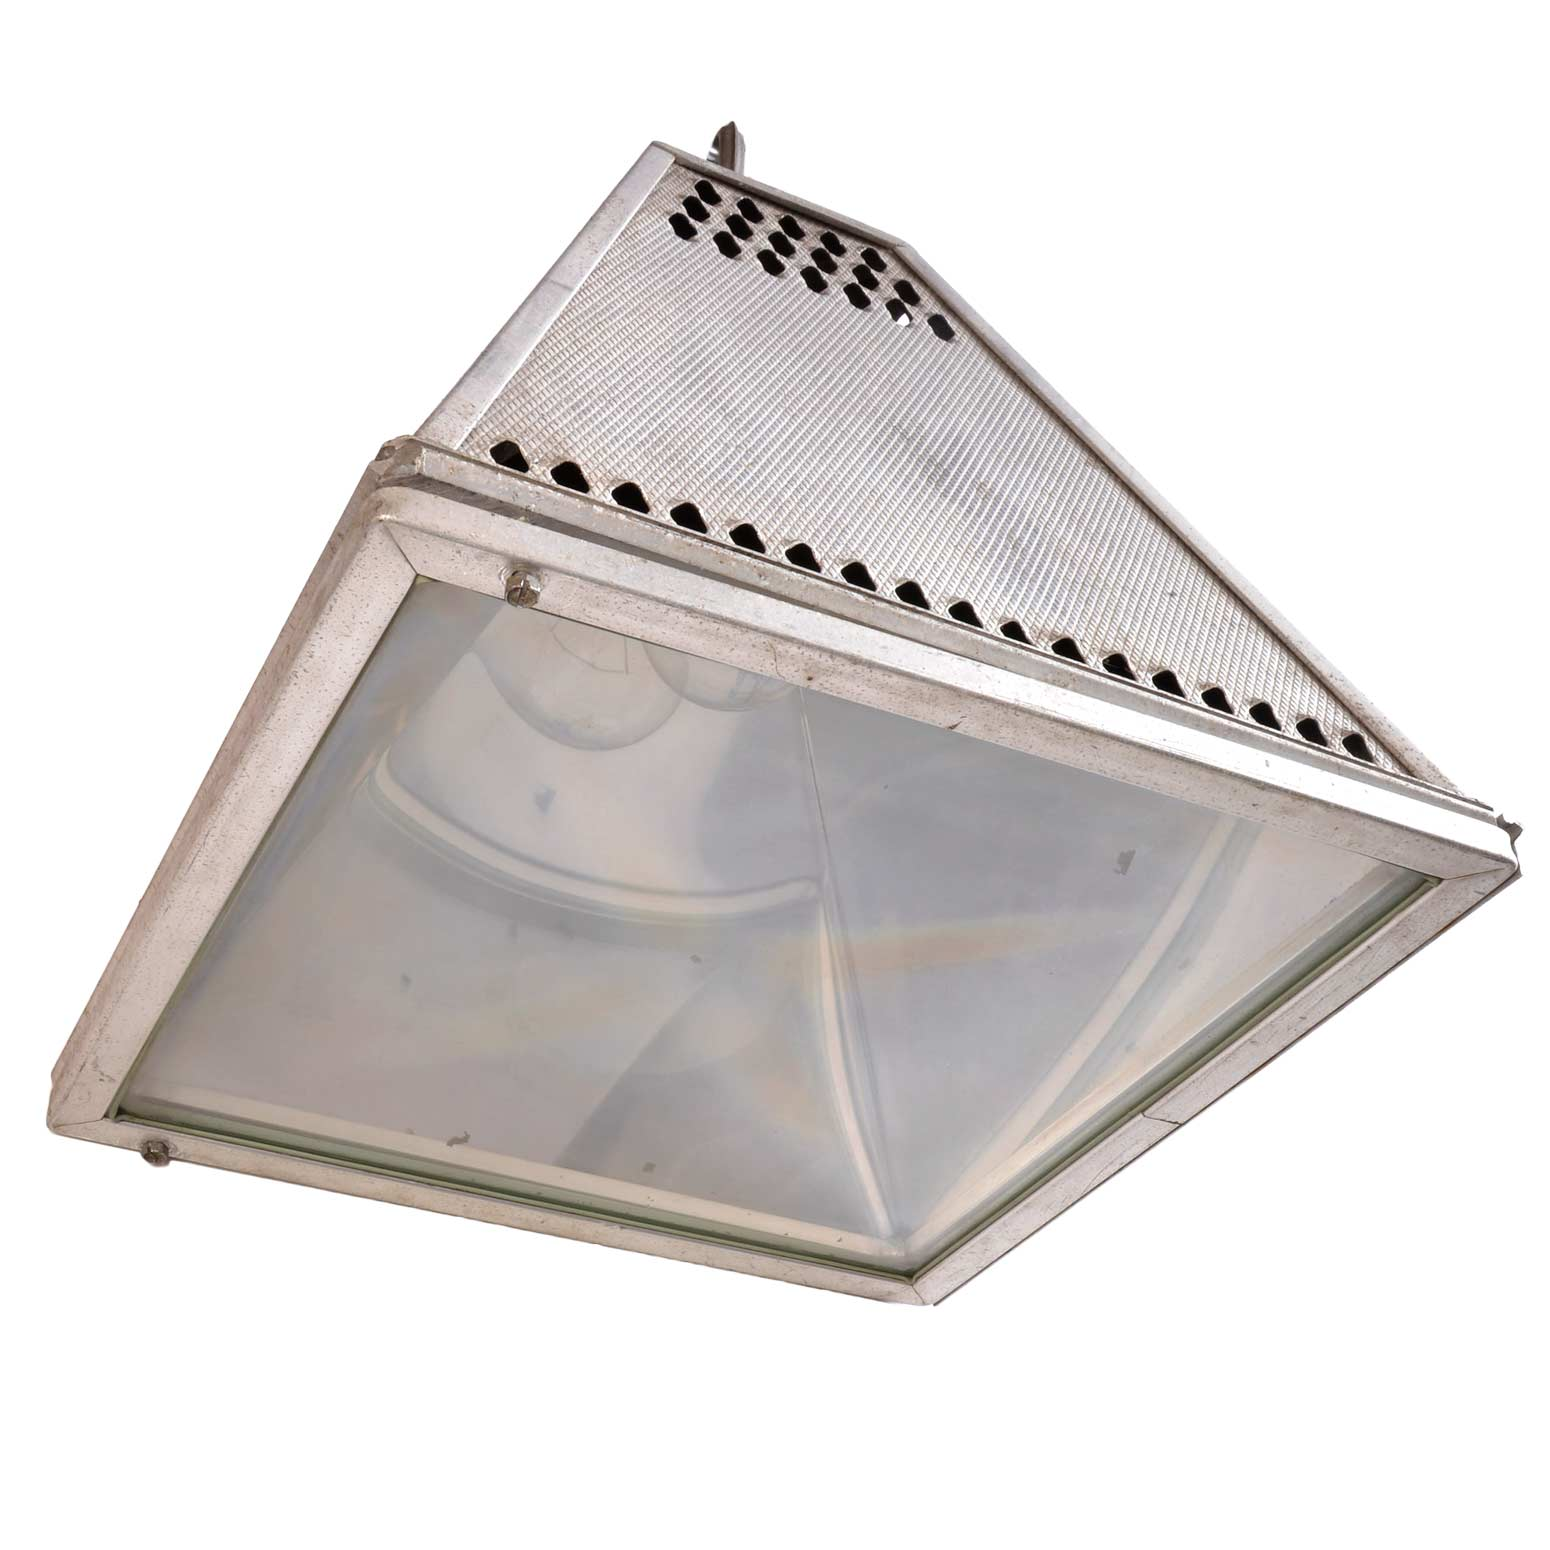 45937-pyramid-industrial-fixture-bottom.jpg